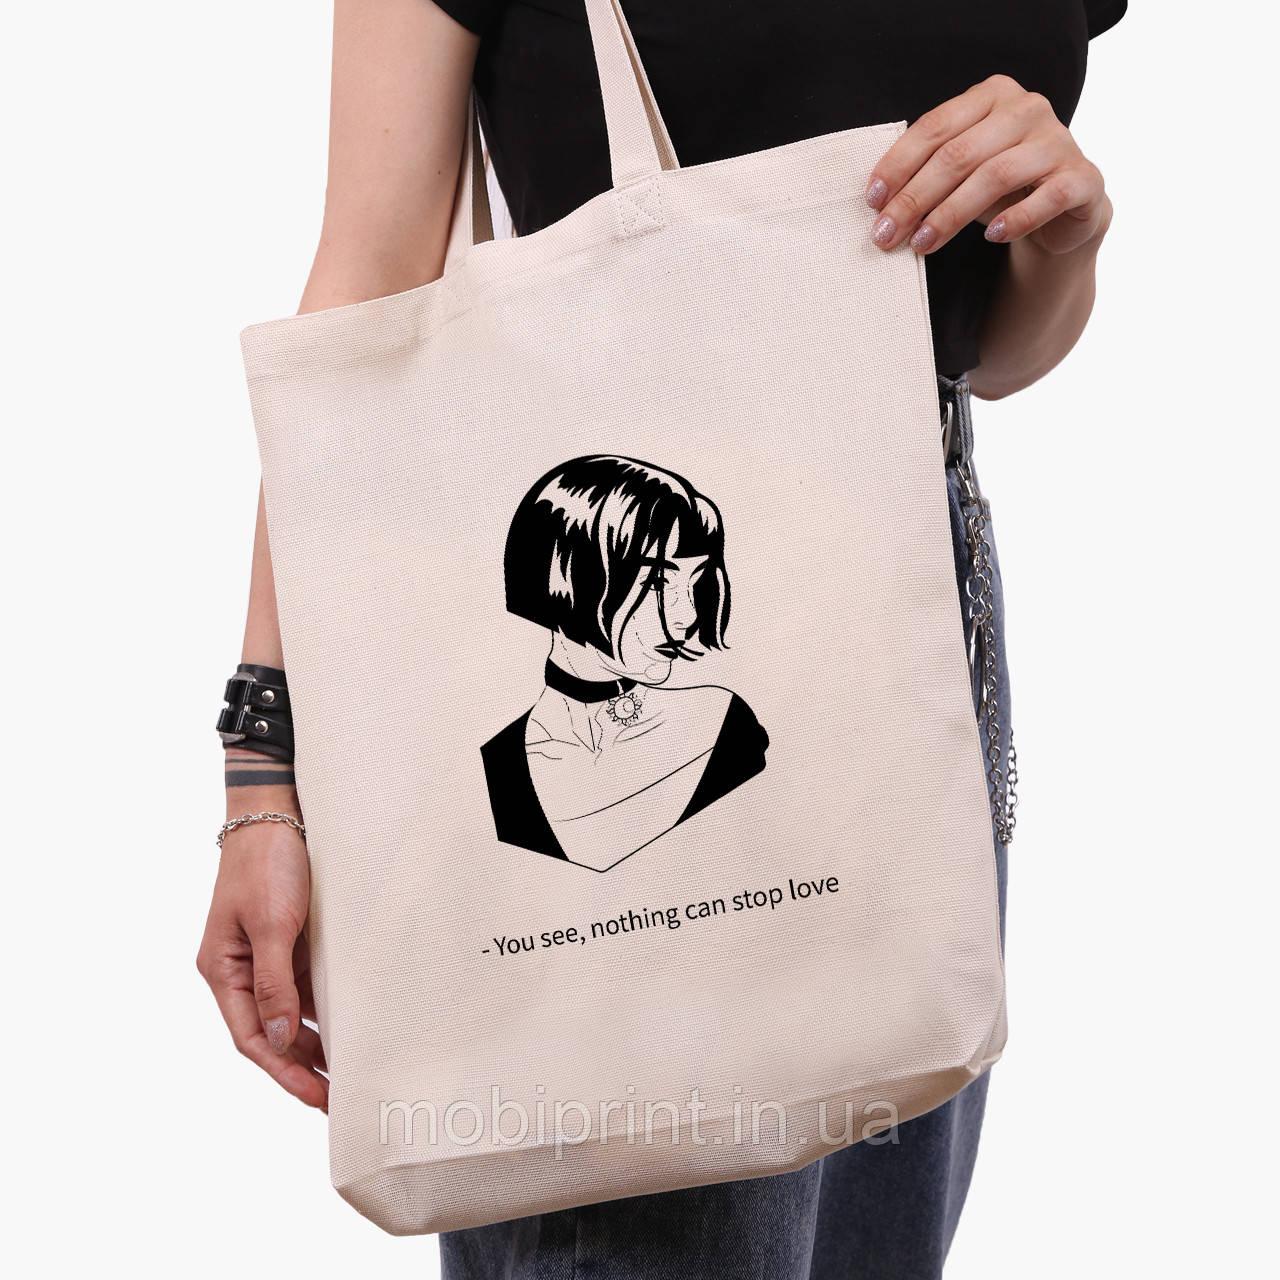 Эко сумка шоппер белая Леон киллер (Leon) (9227-1450-1)  экосумка шопер 41*39*8 см